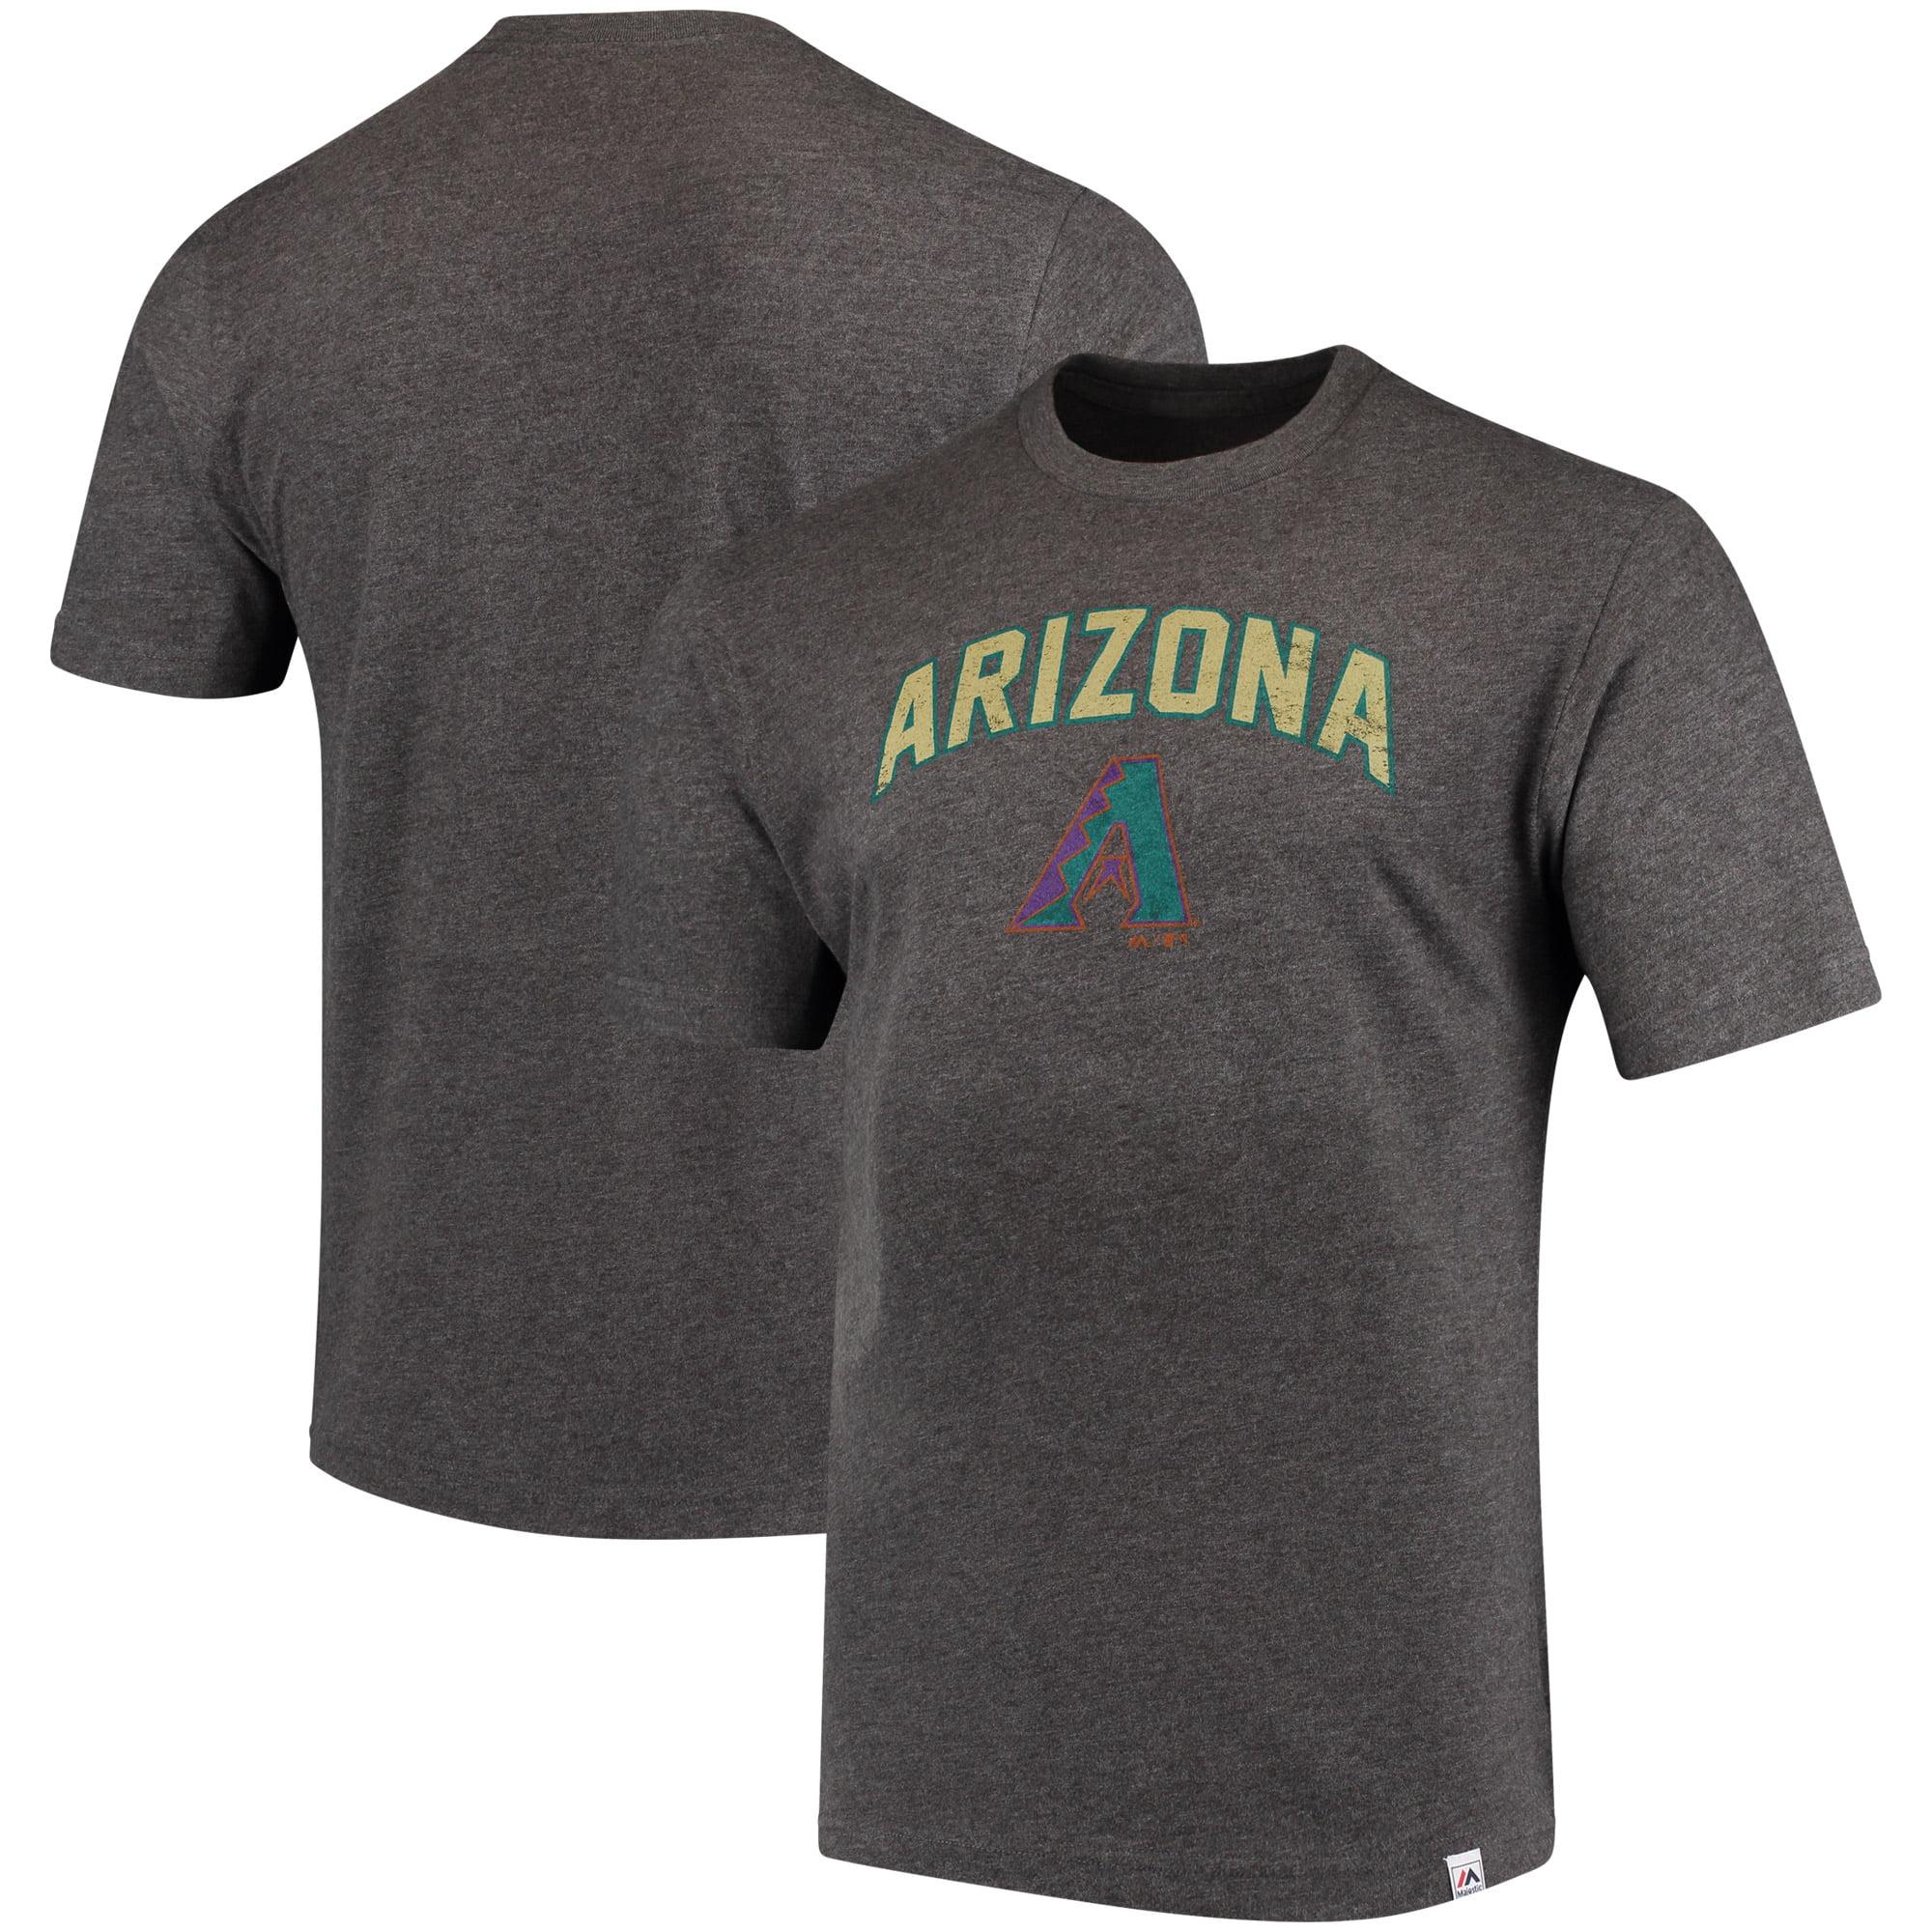 Arizona Diamondbacks Majestic Cooperstown Collection Eephus Pitch Softhand T-Shirt - Gray